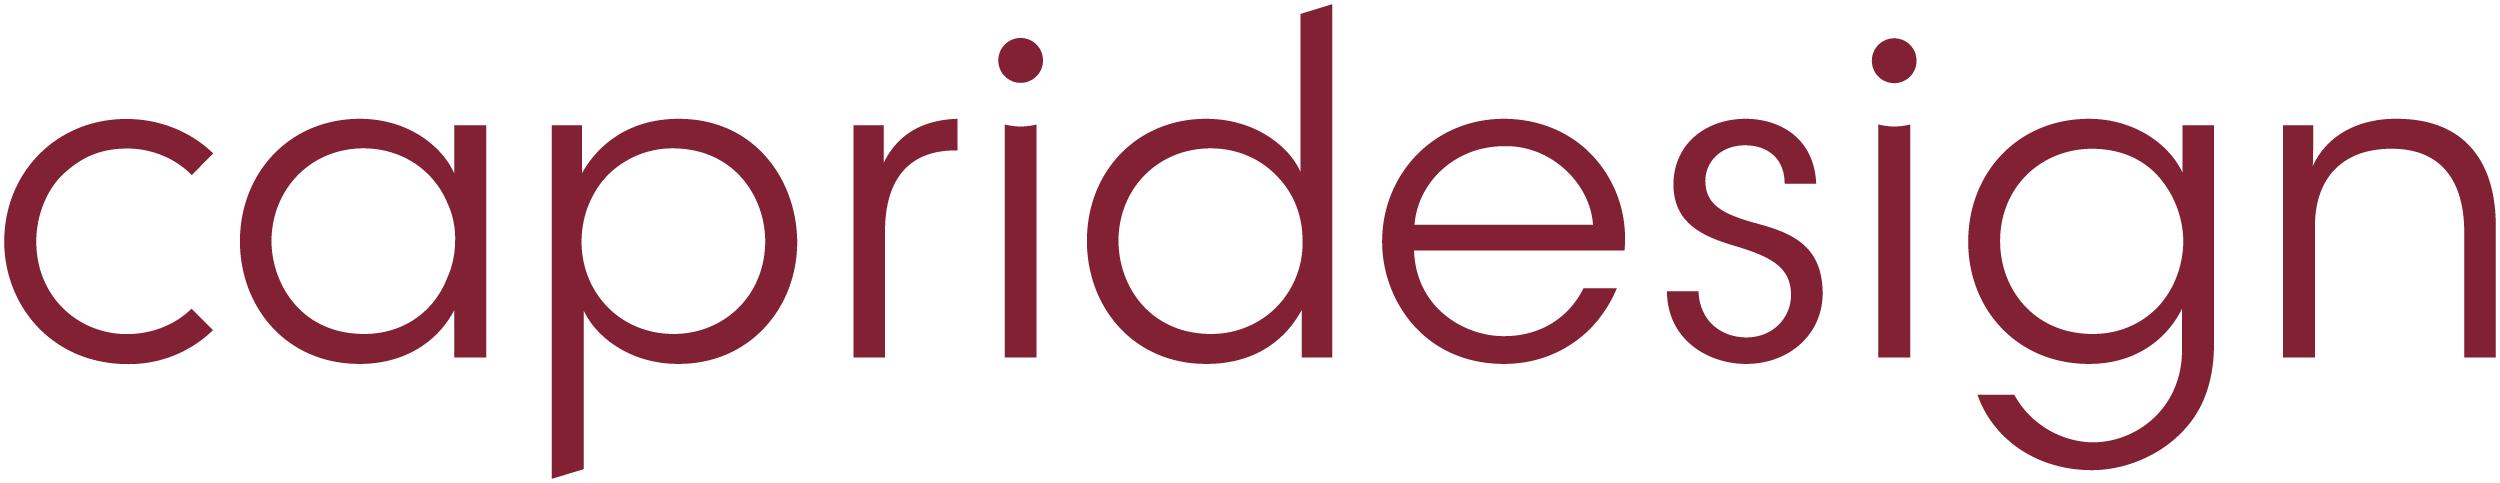 Logo capridesgign